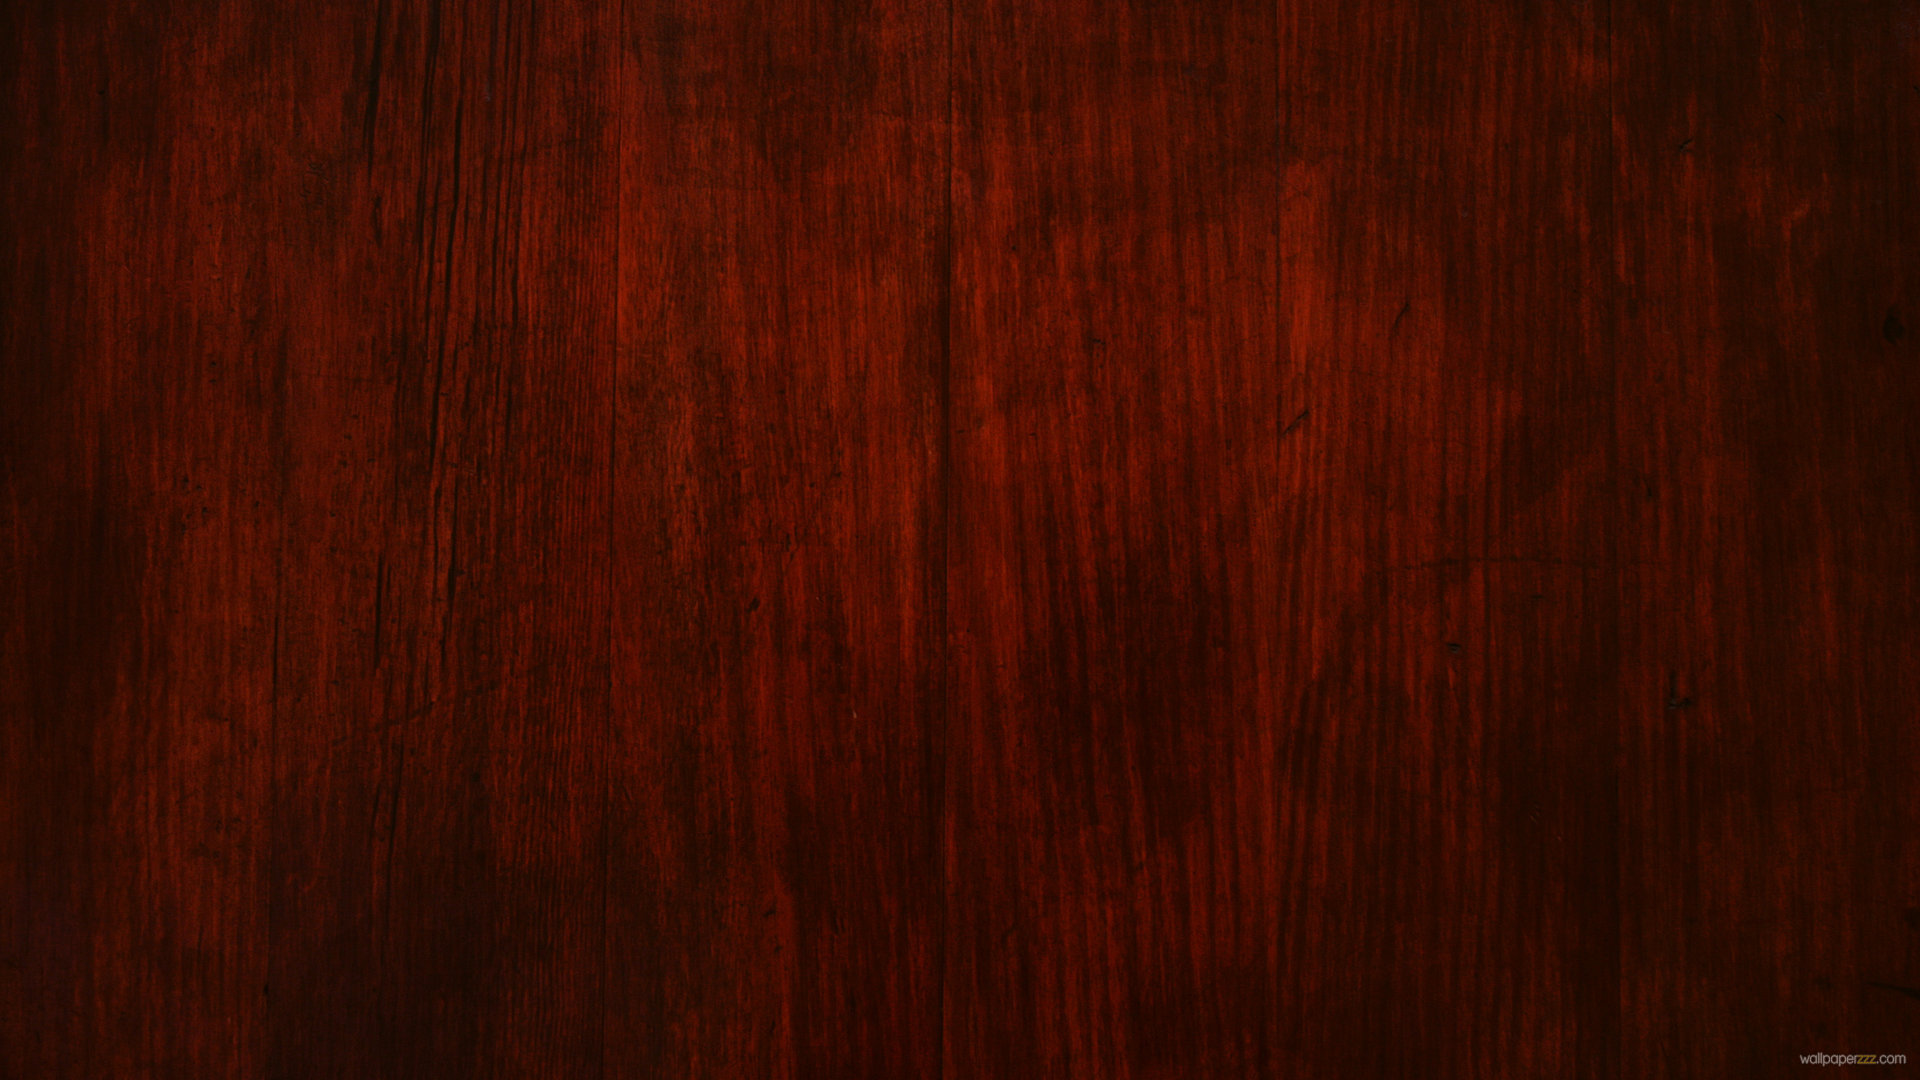 Wooden Texture Wallpaper Textured Wallpapers Hires 1920x1080